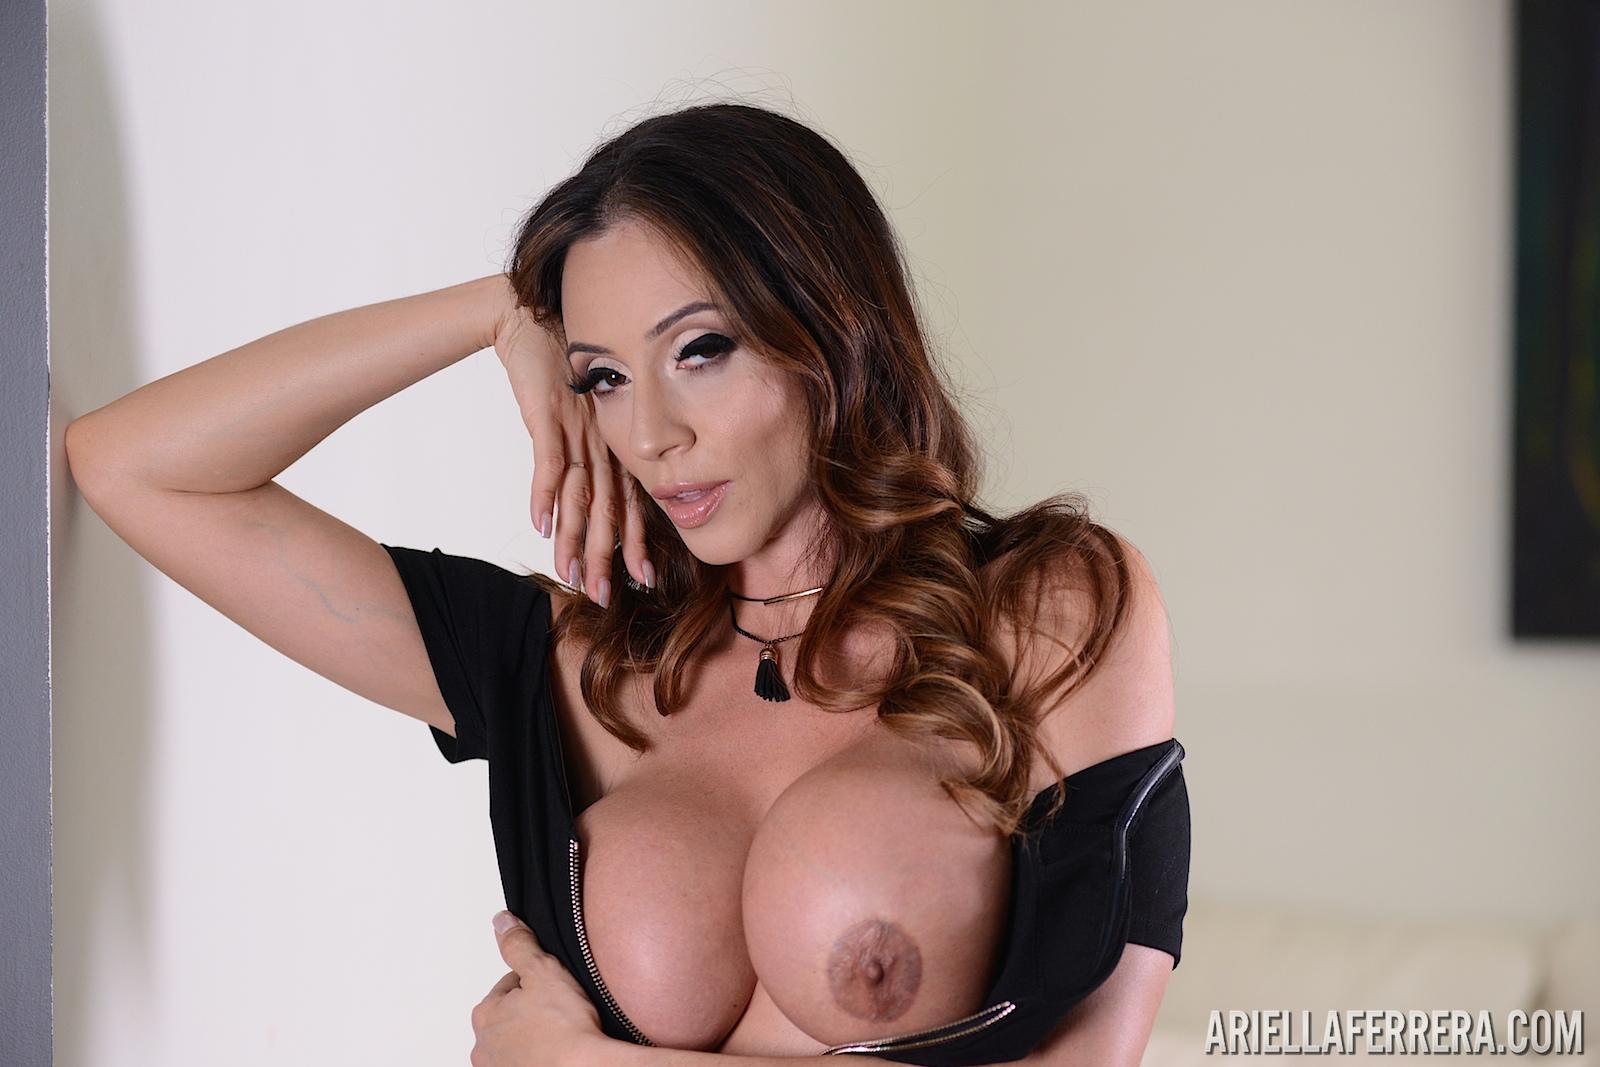 Ariella Ferrera Big Tis not in a Little Black Dress